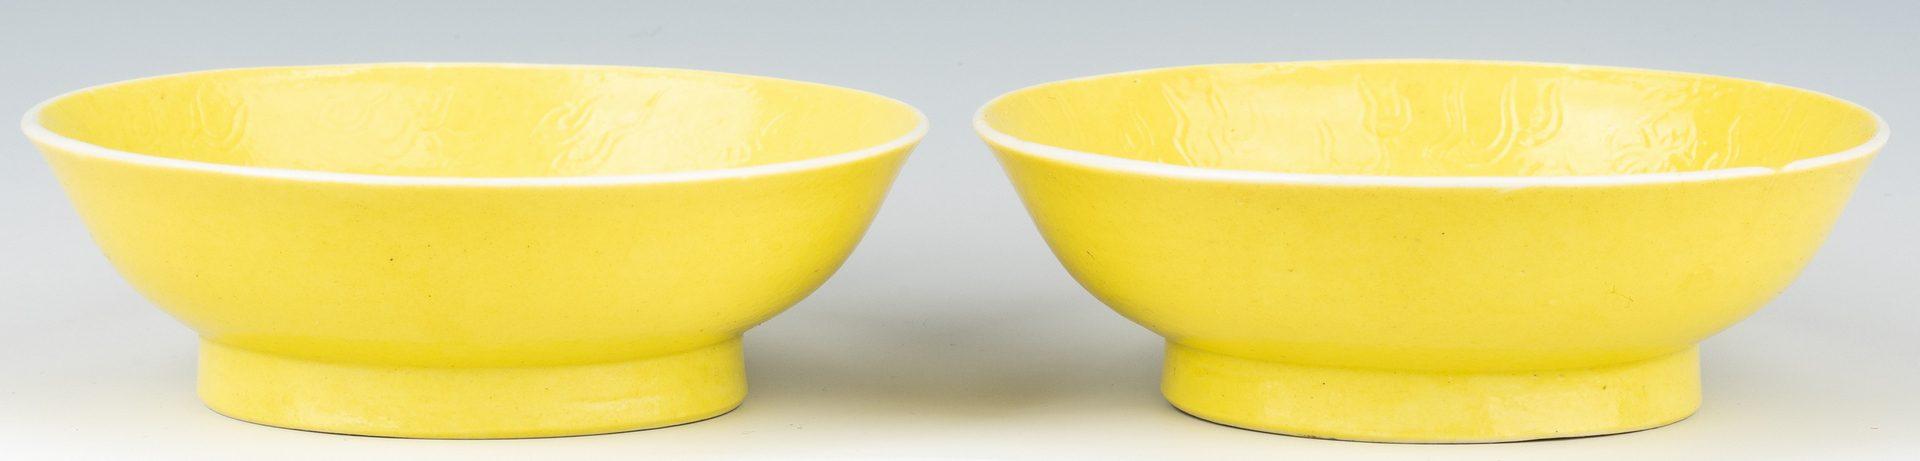 Lot 19: Pr. Guangxu Lemon Yellow Saucer Dishes, ex-Vermeer